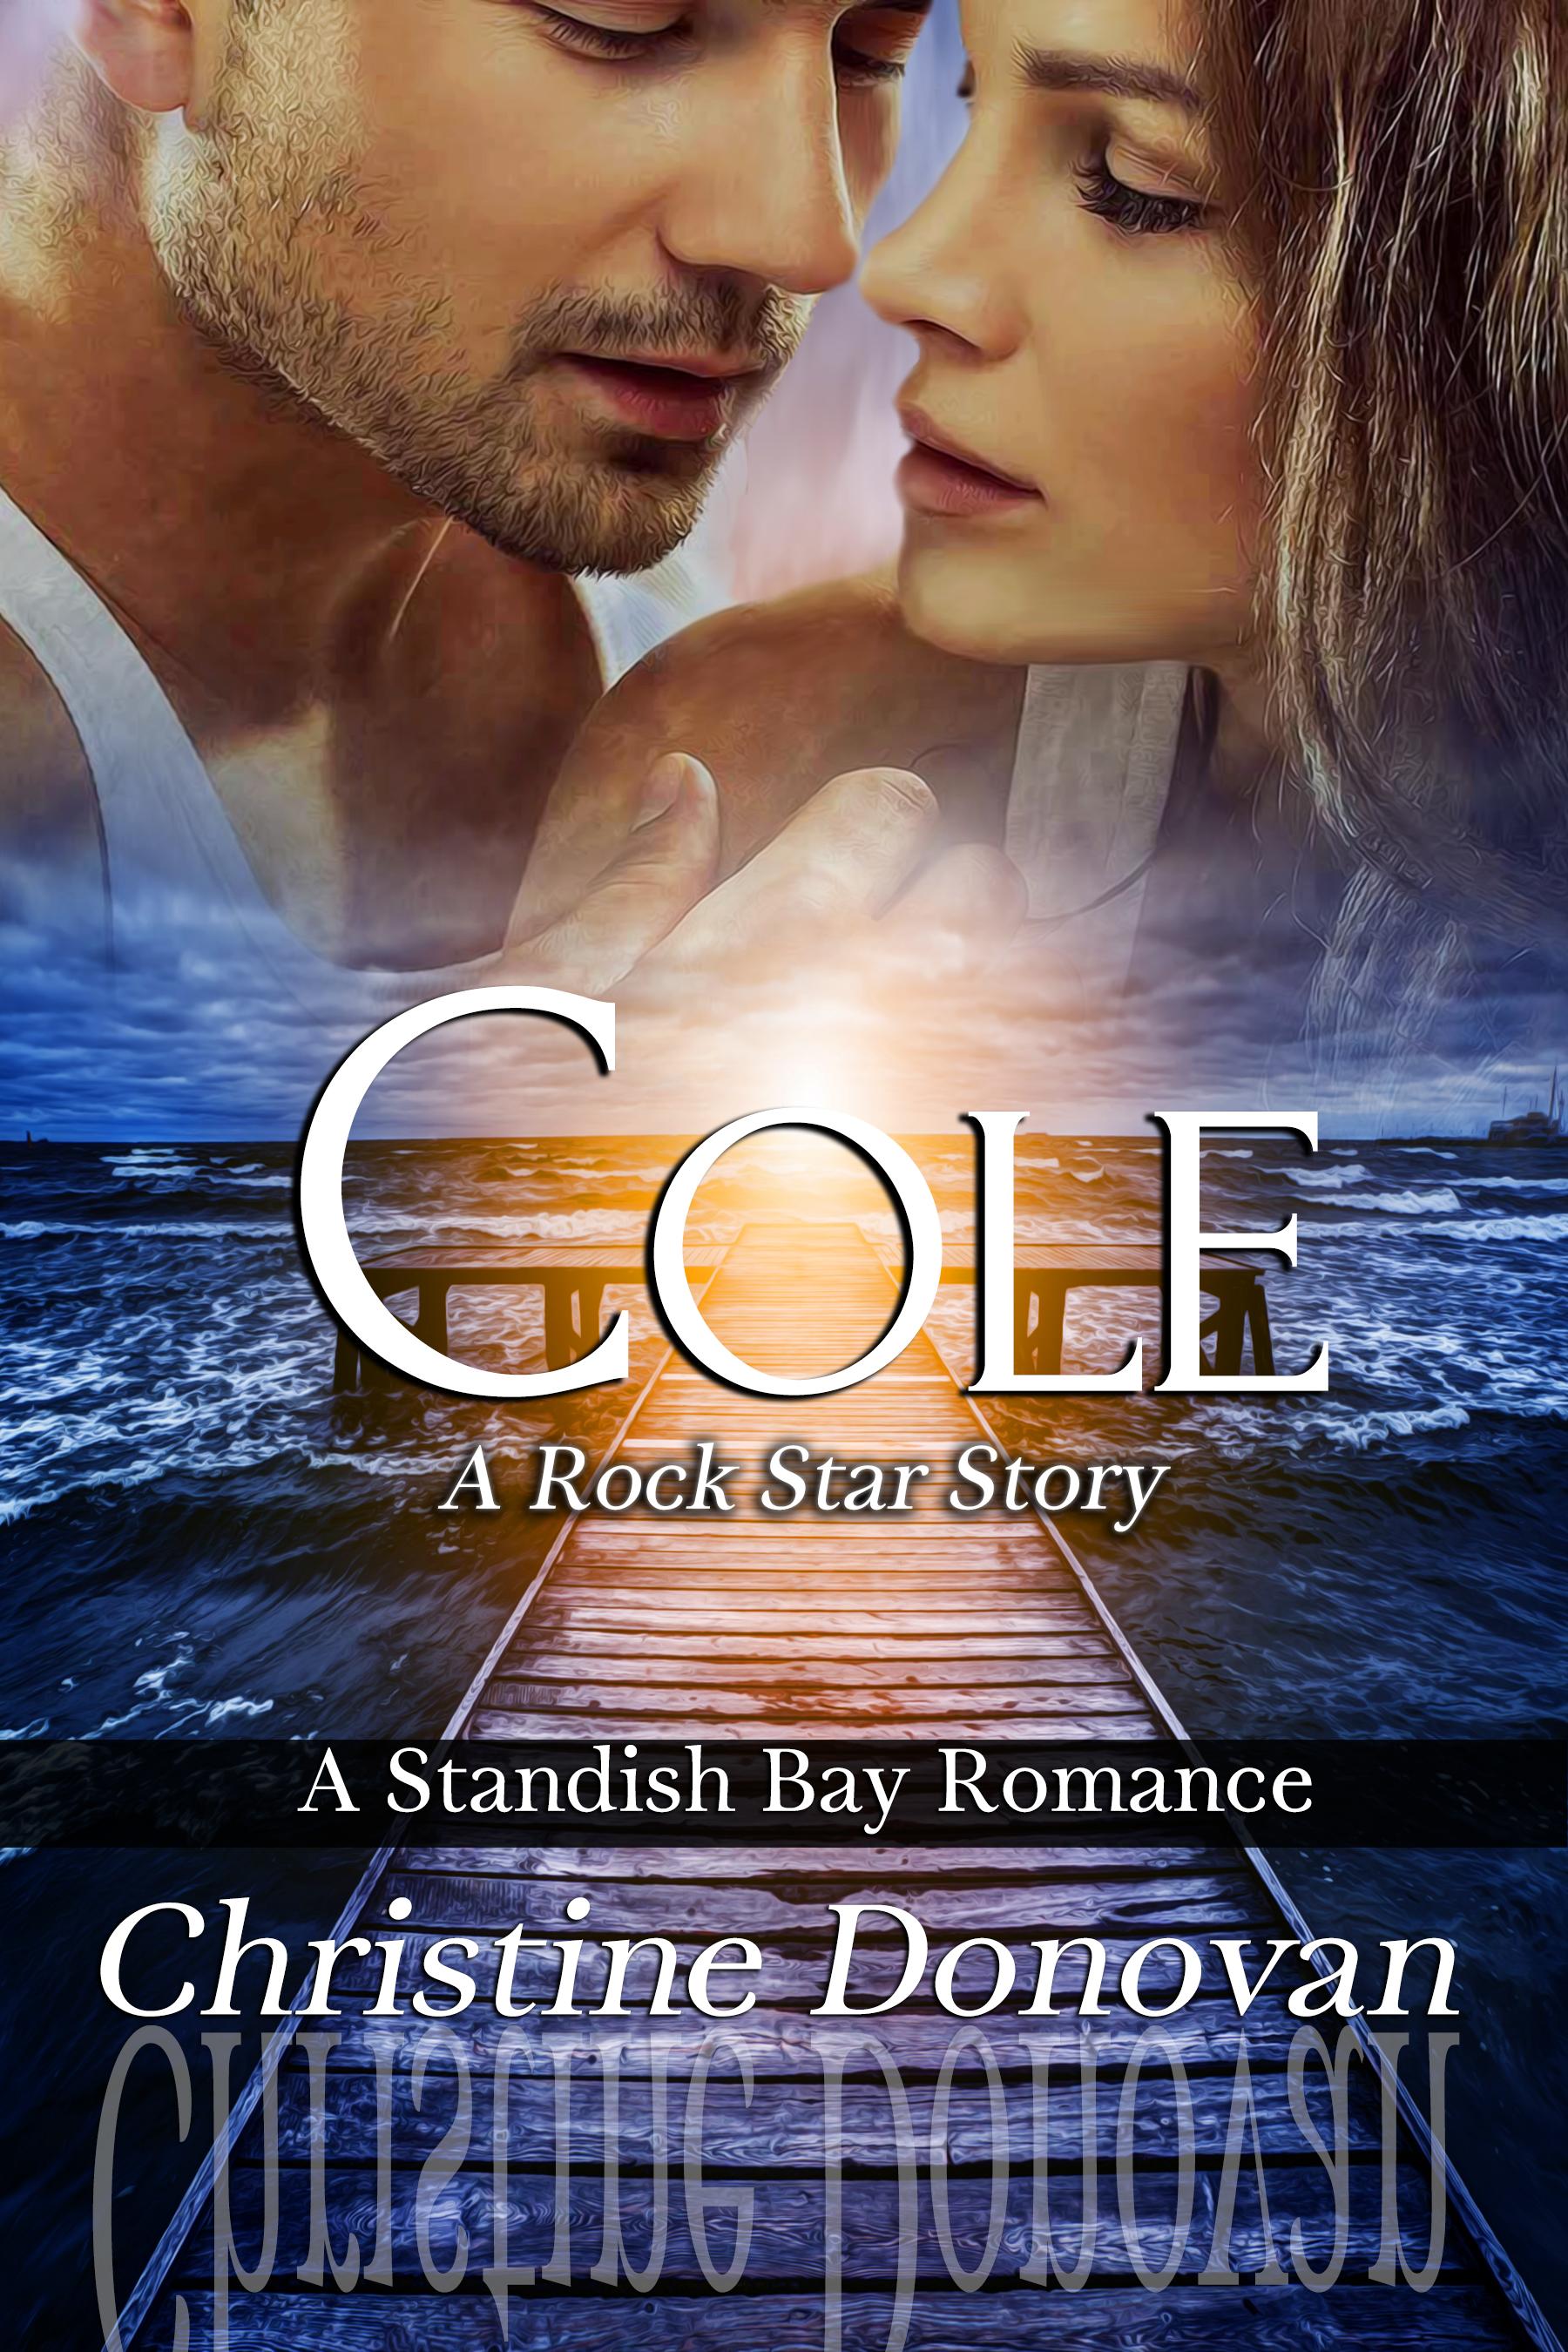 A standish bay romance